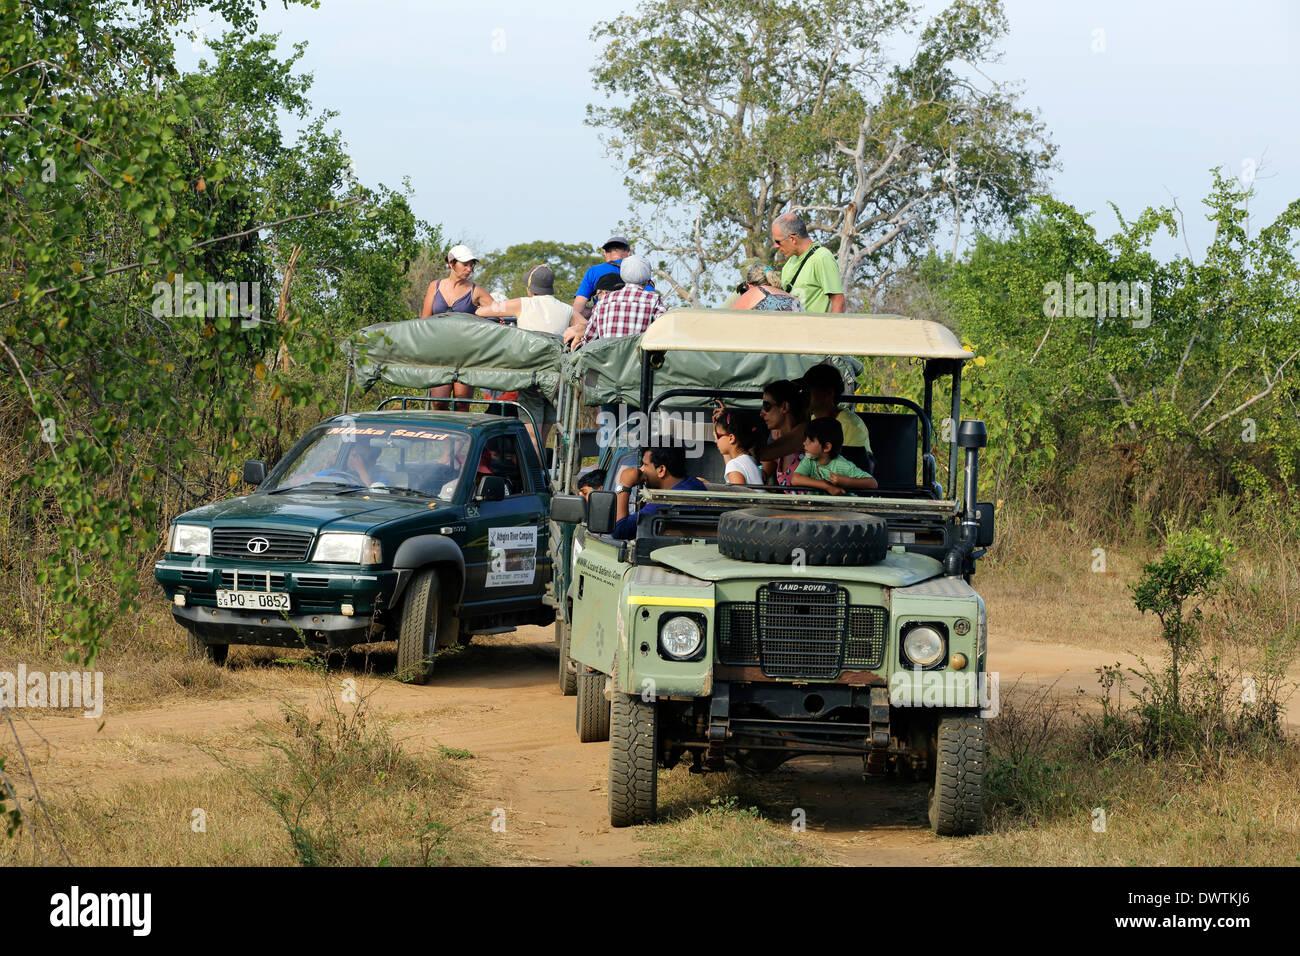 Safari jeeps full of tourists inside Udawalawe National Park in Sri Lanka - Stock Image